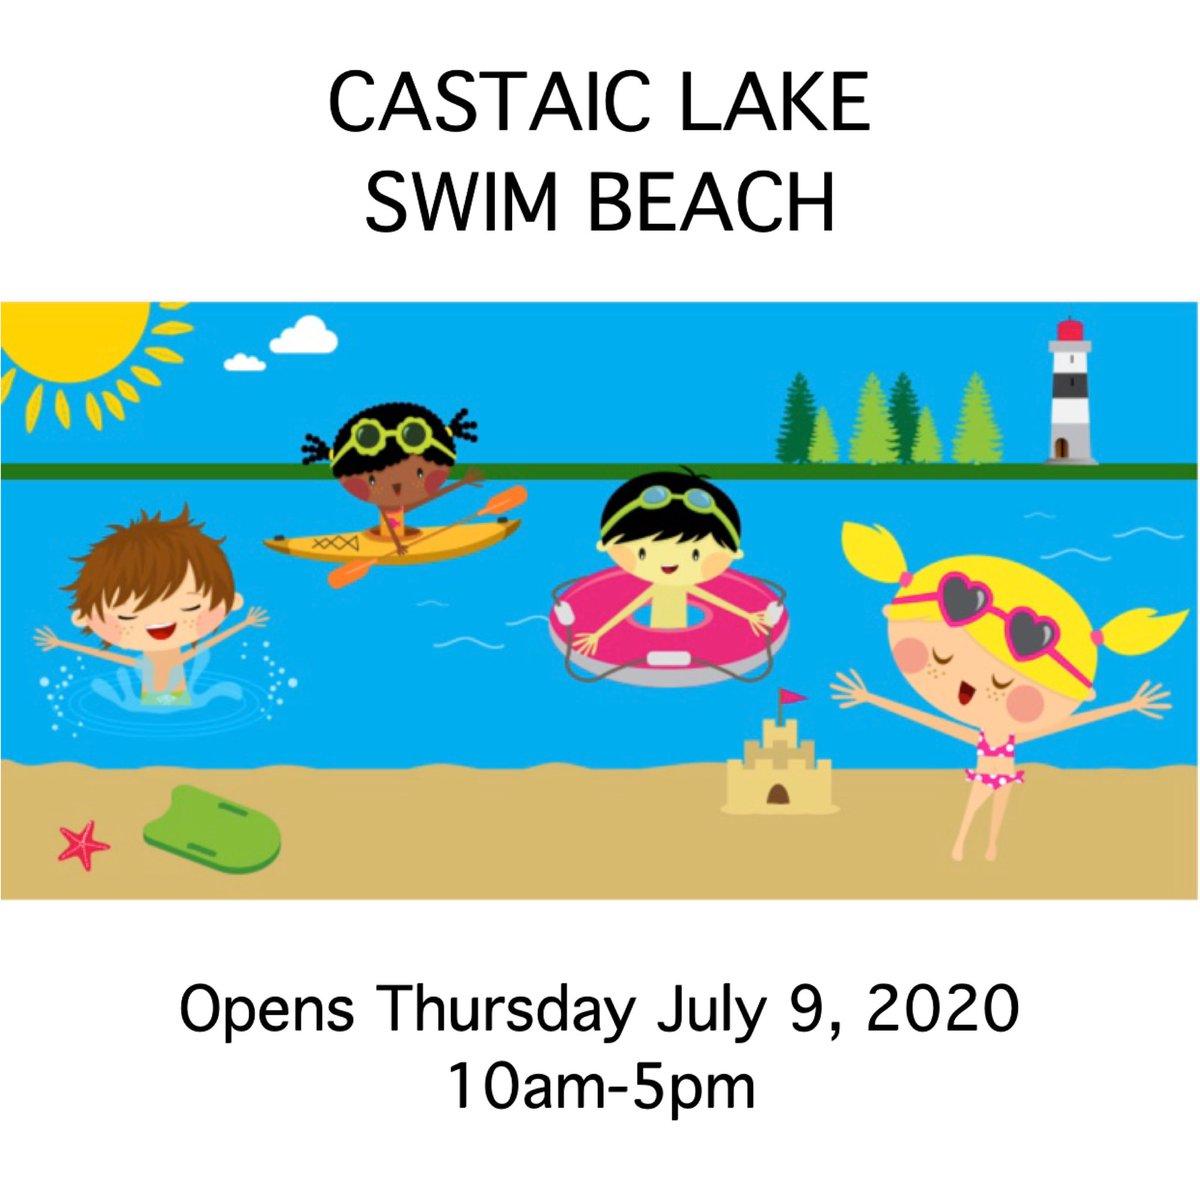 Swim Beach opens TOMORROW! Beach will be open Thursday-Sunday 10a-5p #castaiclake #castaic #friendsofcastaiclake #focl #swimming #beach #waterplay #summertimefun #summertime